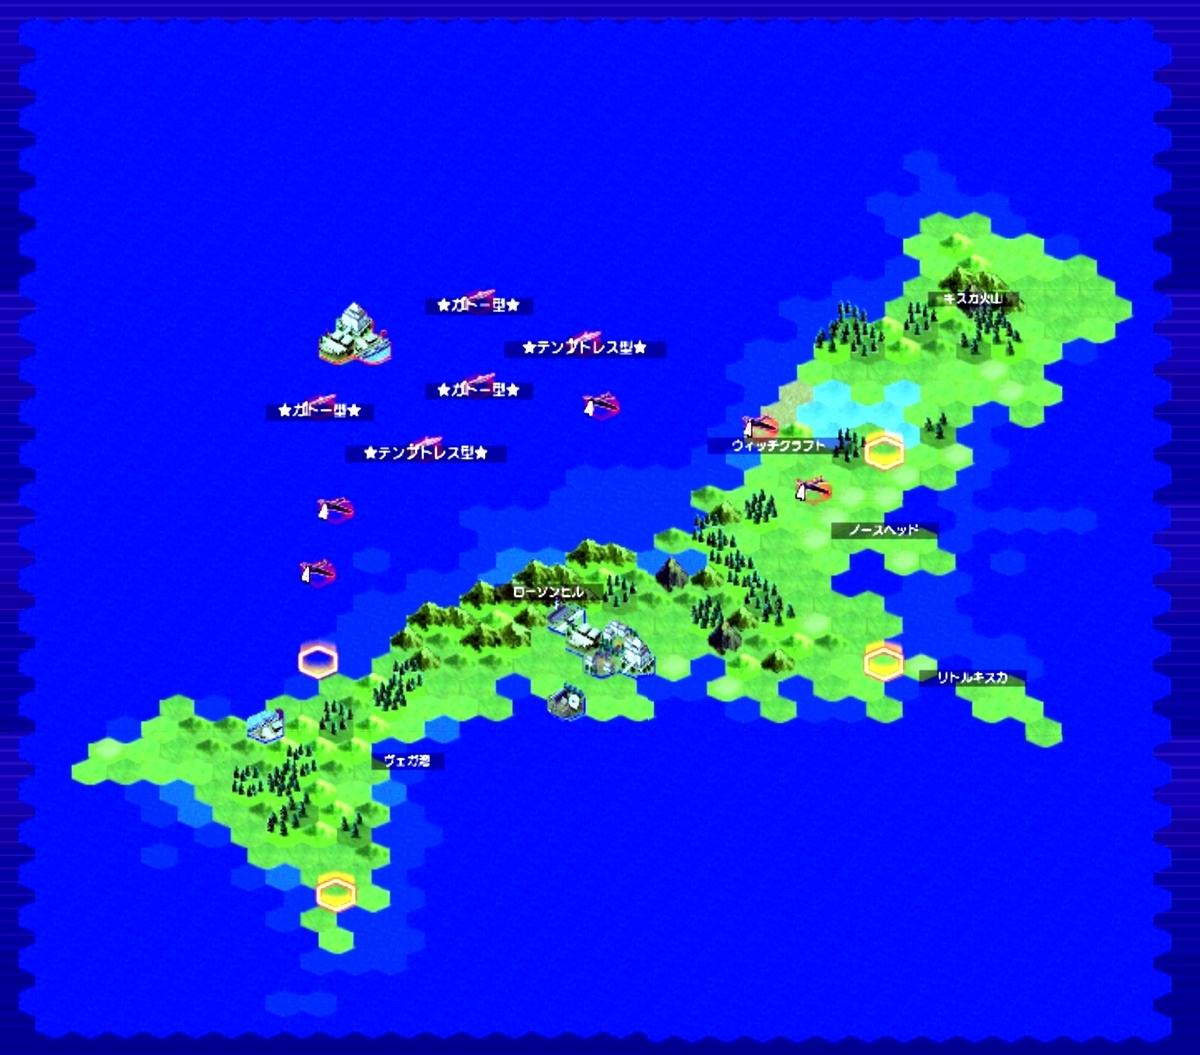 f:id:TsunaTsunaTsuna:20210715171959j:plain